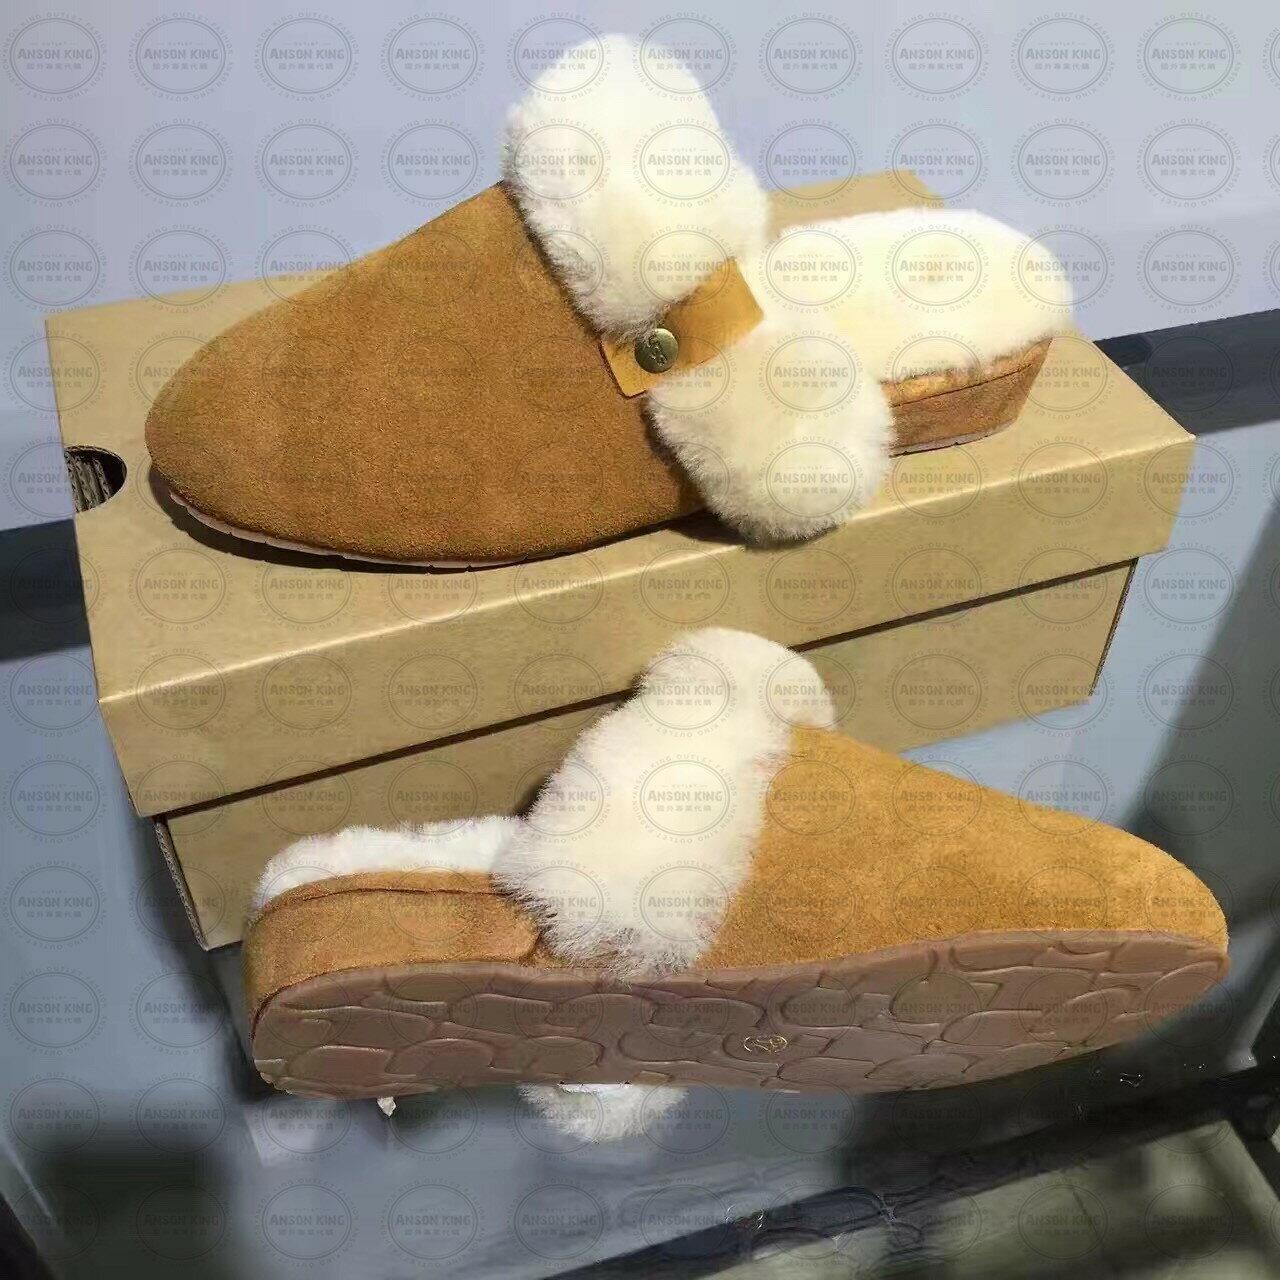 OUTLET代購 UGG 毛毛居家拖鞋 懶人鞋 真皮羊皮毛 雪靴 長靴 短靴 駝色 2